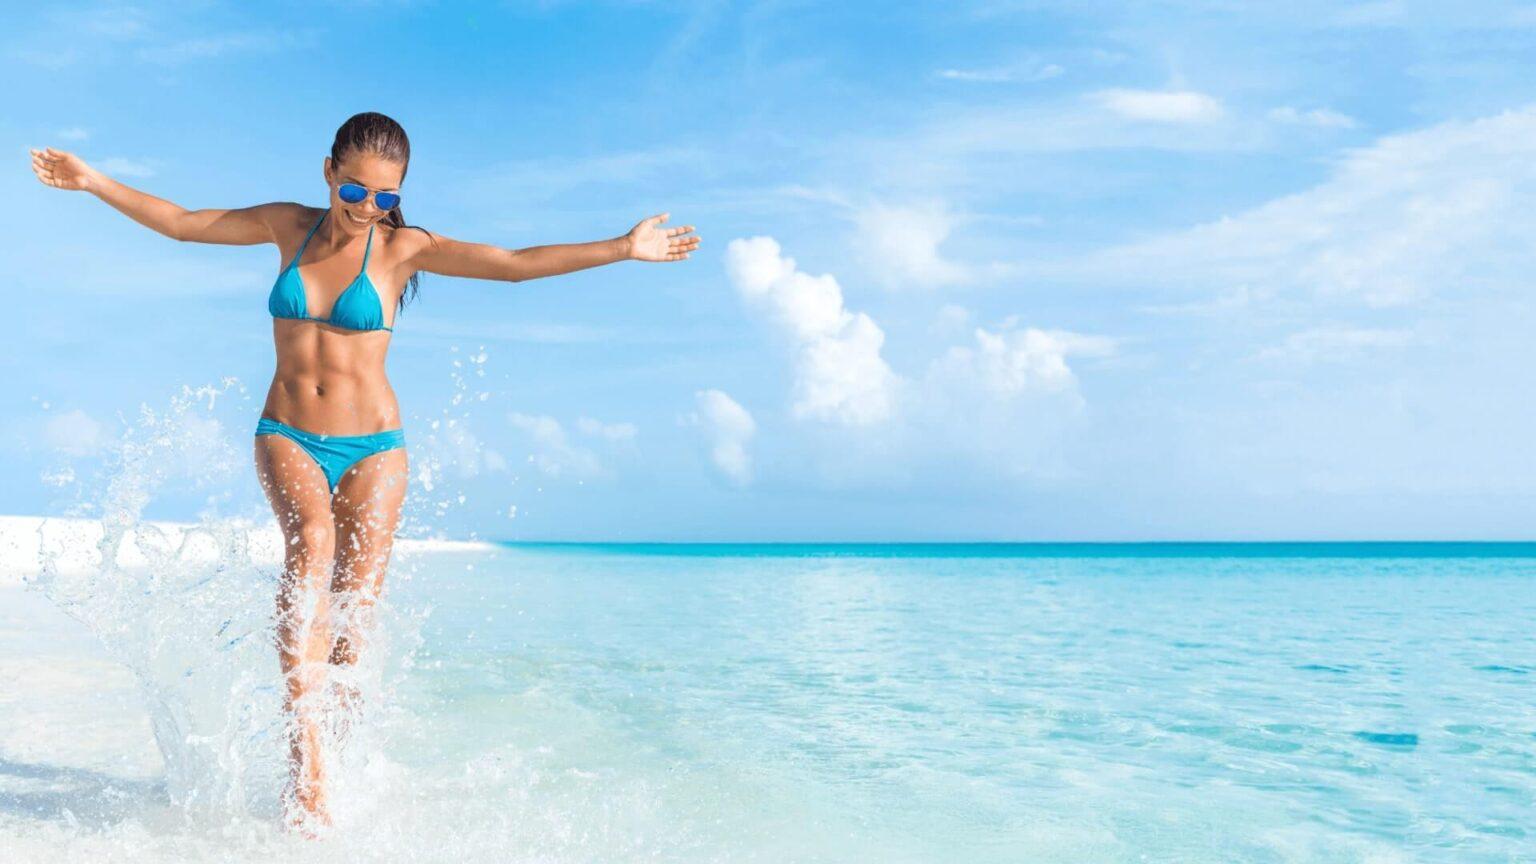 Sexy woman wearing swimsuit in the ocean